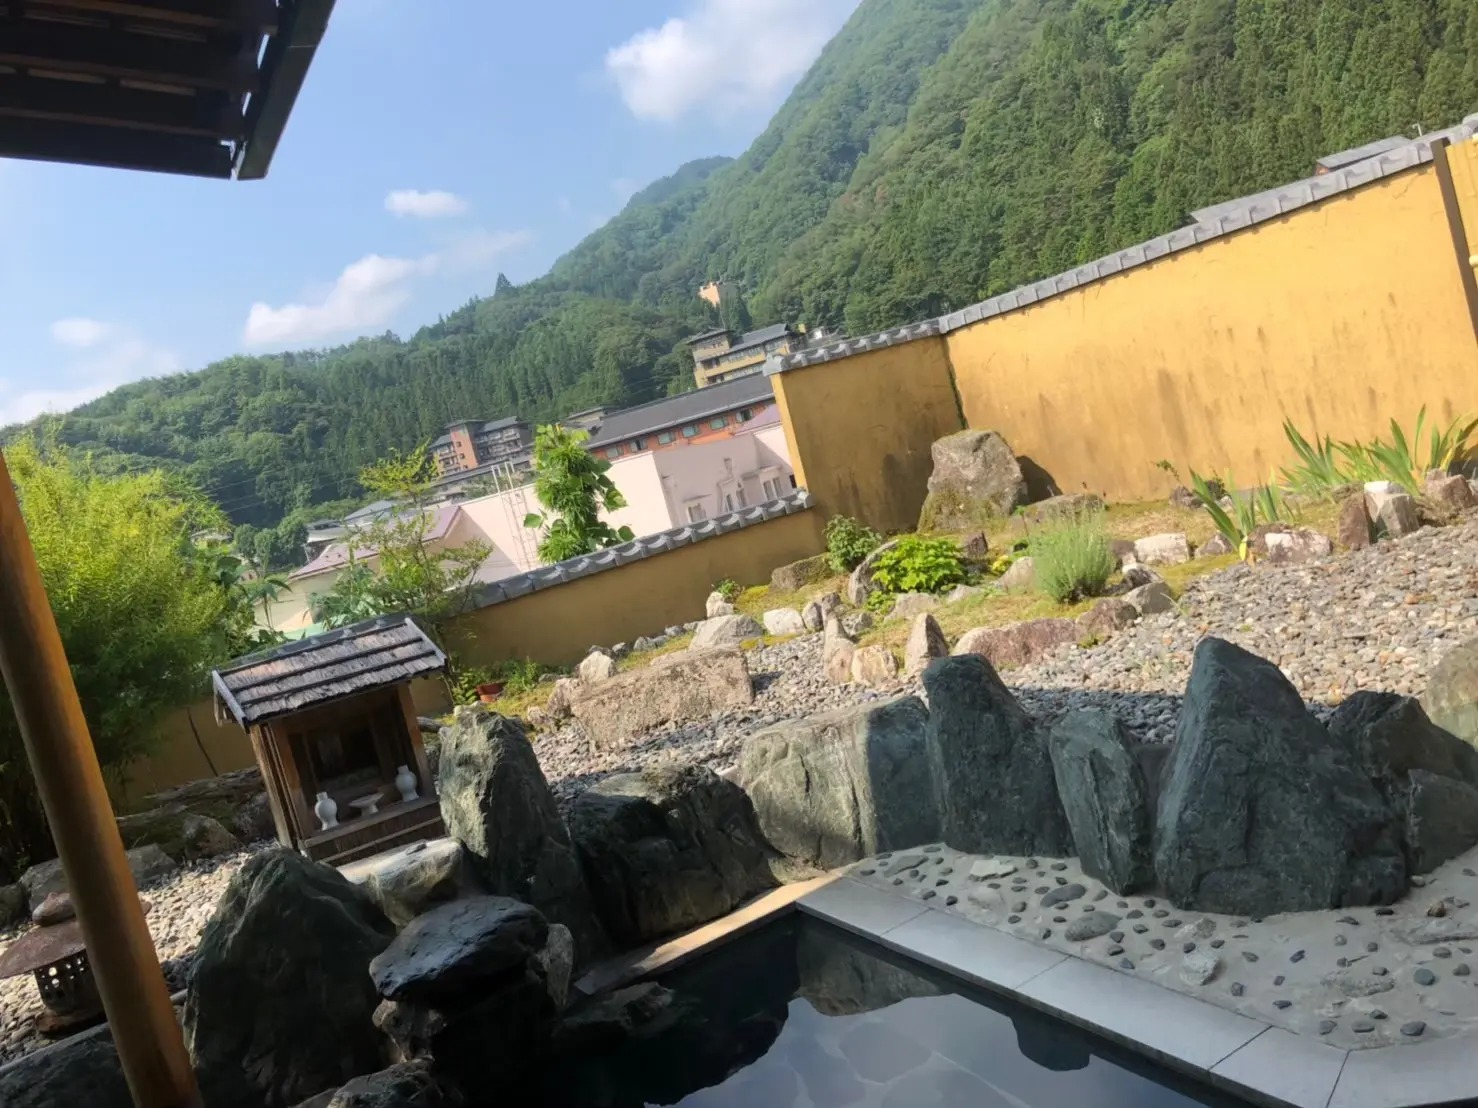 長野県・阿智村の昼神温泉